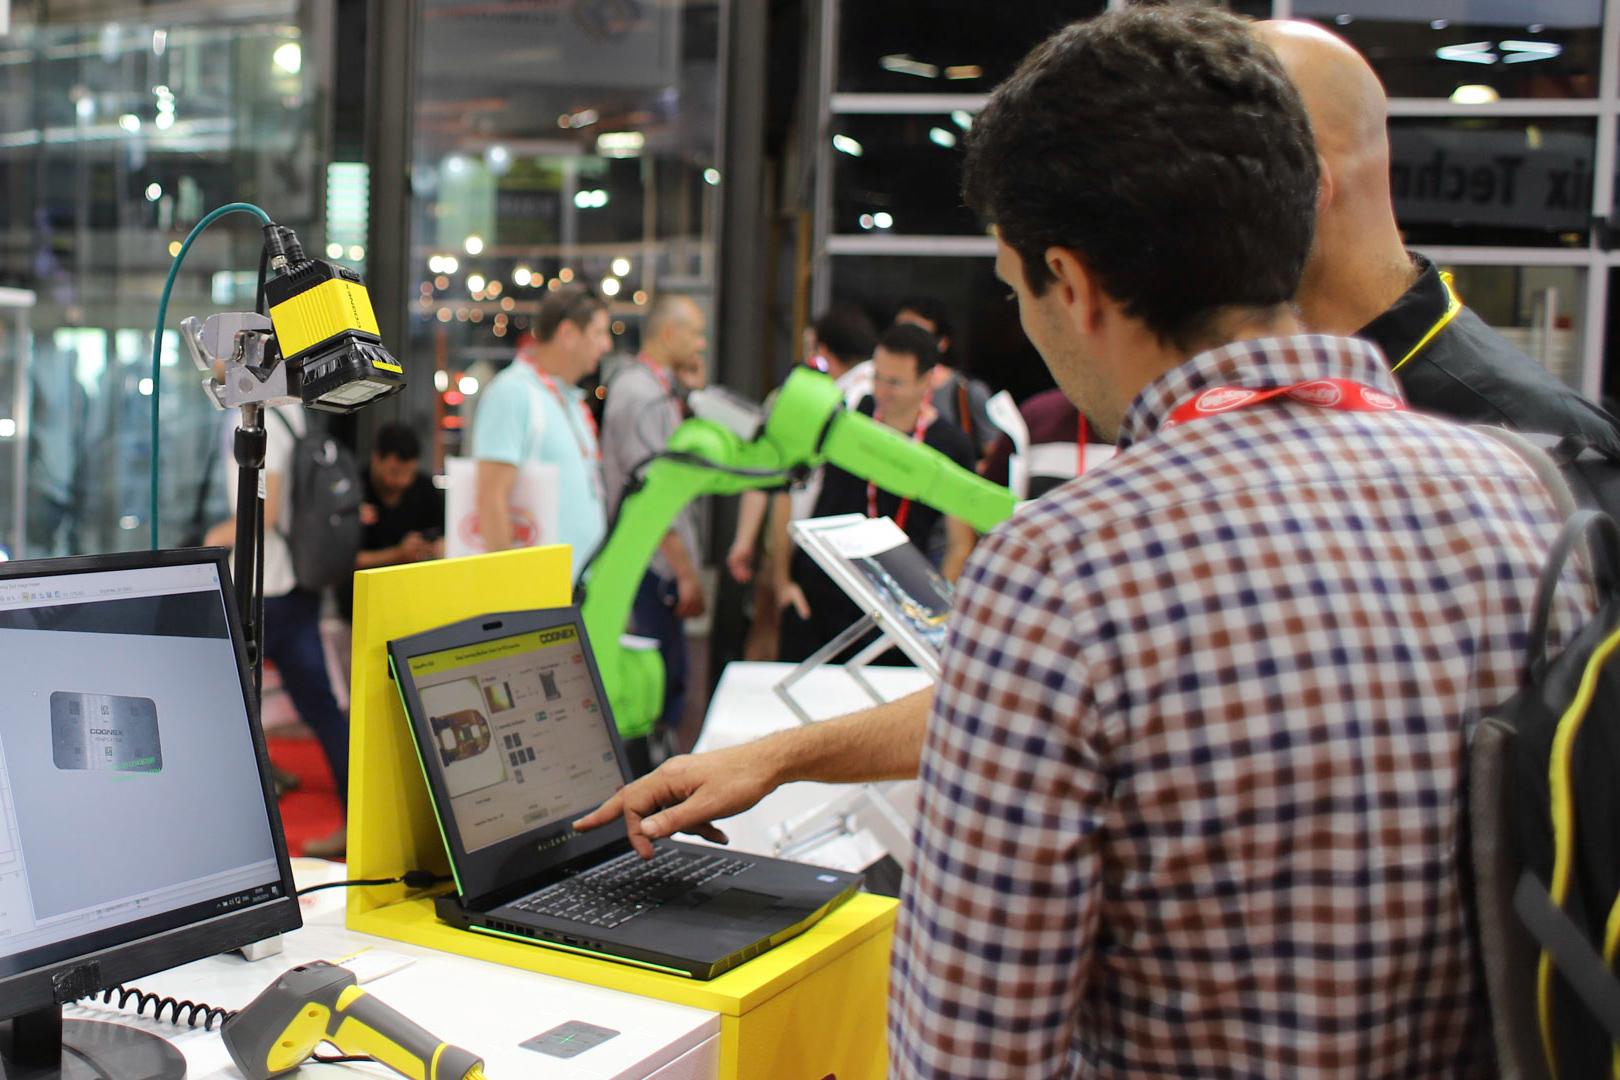 MechanicalEngineering.net: Machine Vision Market